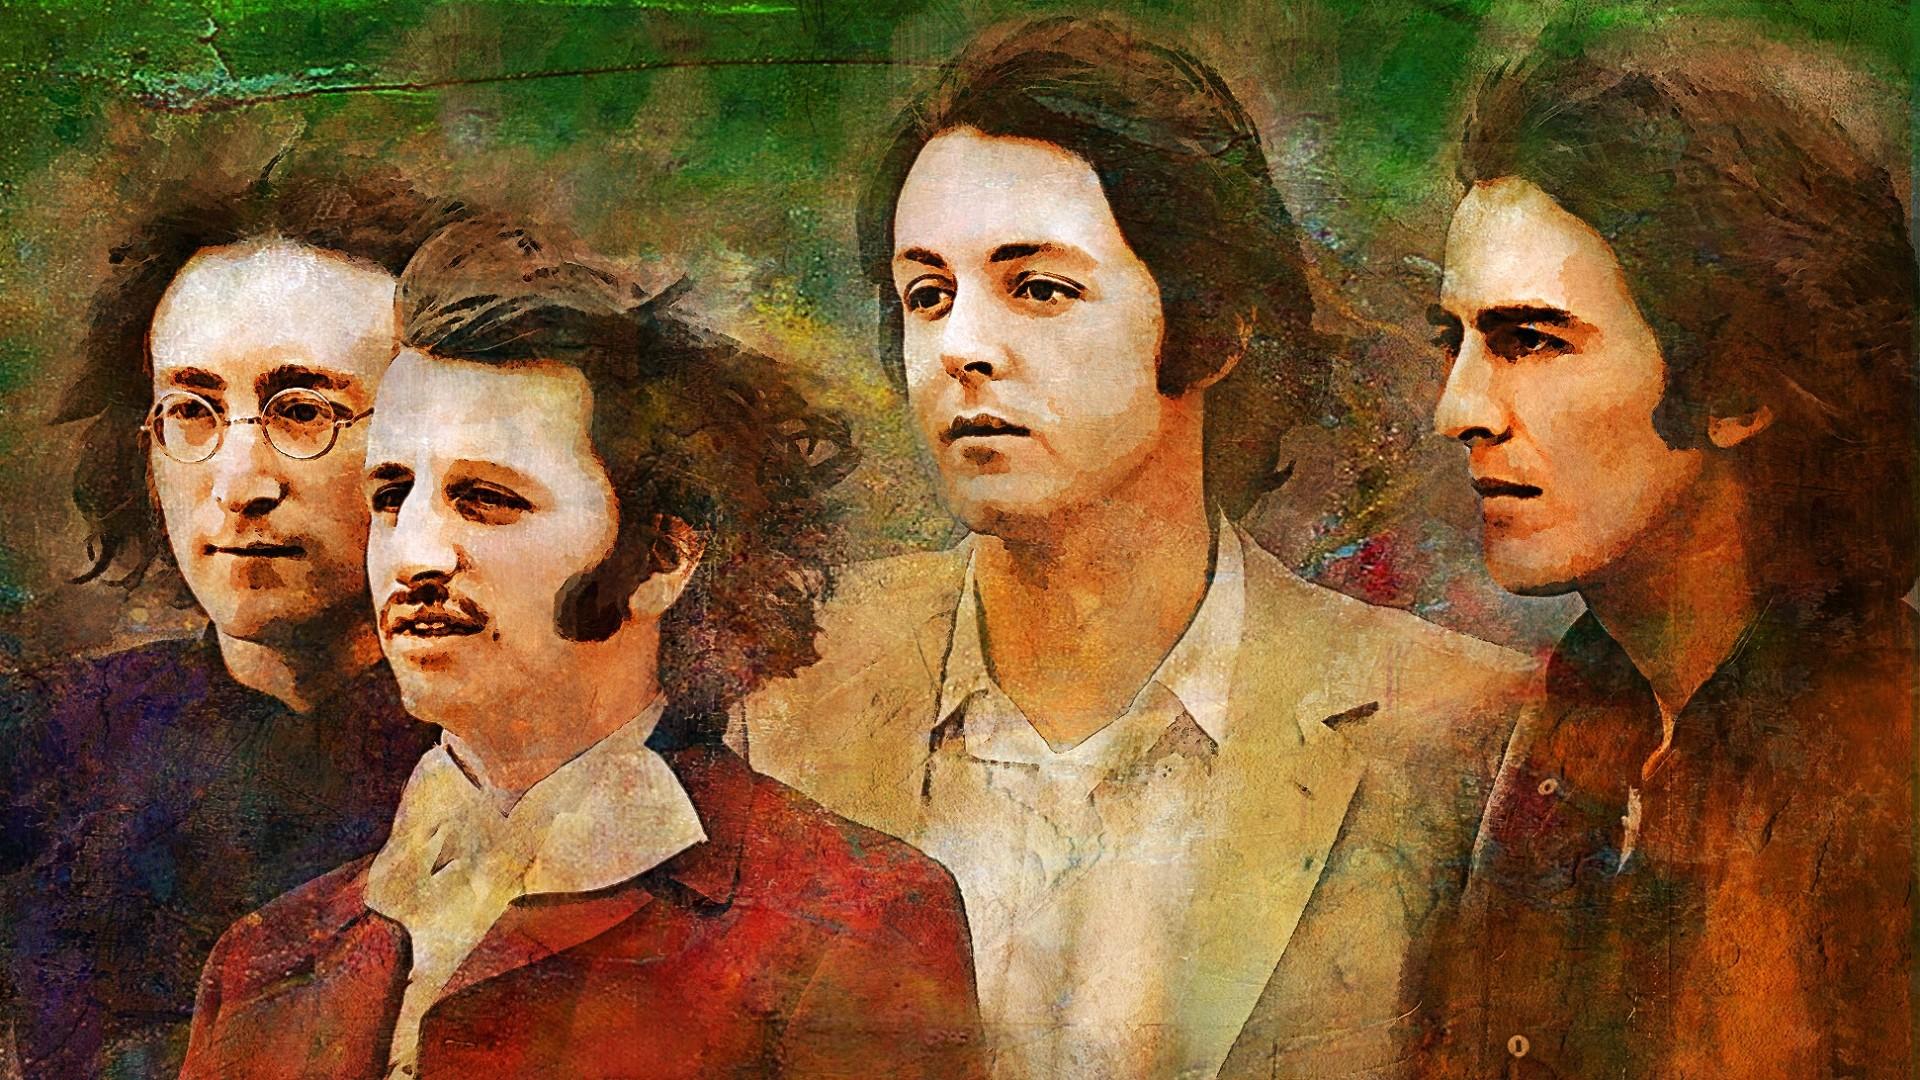 1920x1080 Preview Wallpaper The Beatles John Lennon Paul Mccartney George Harrison Ringo